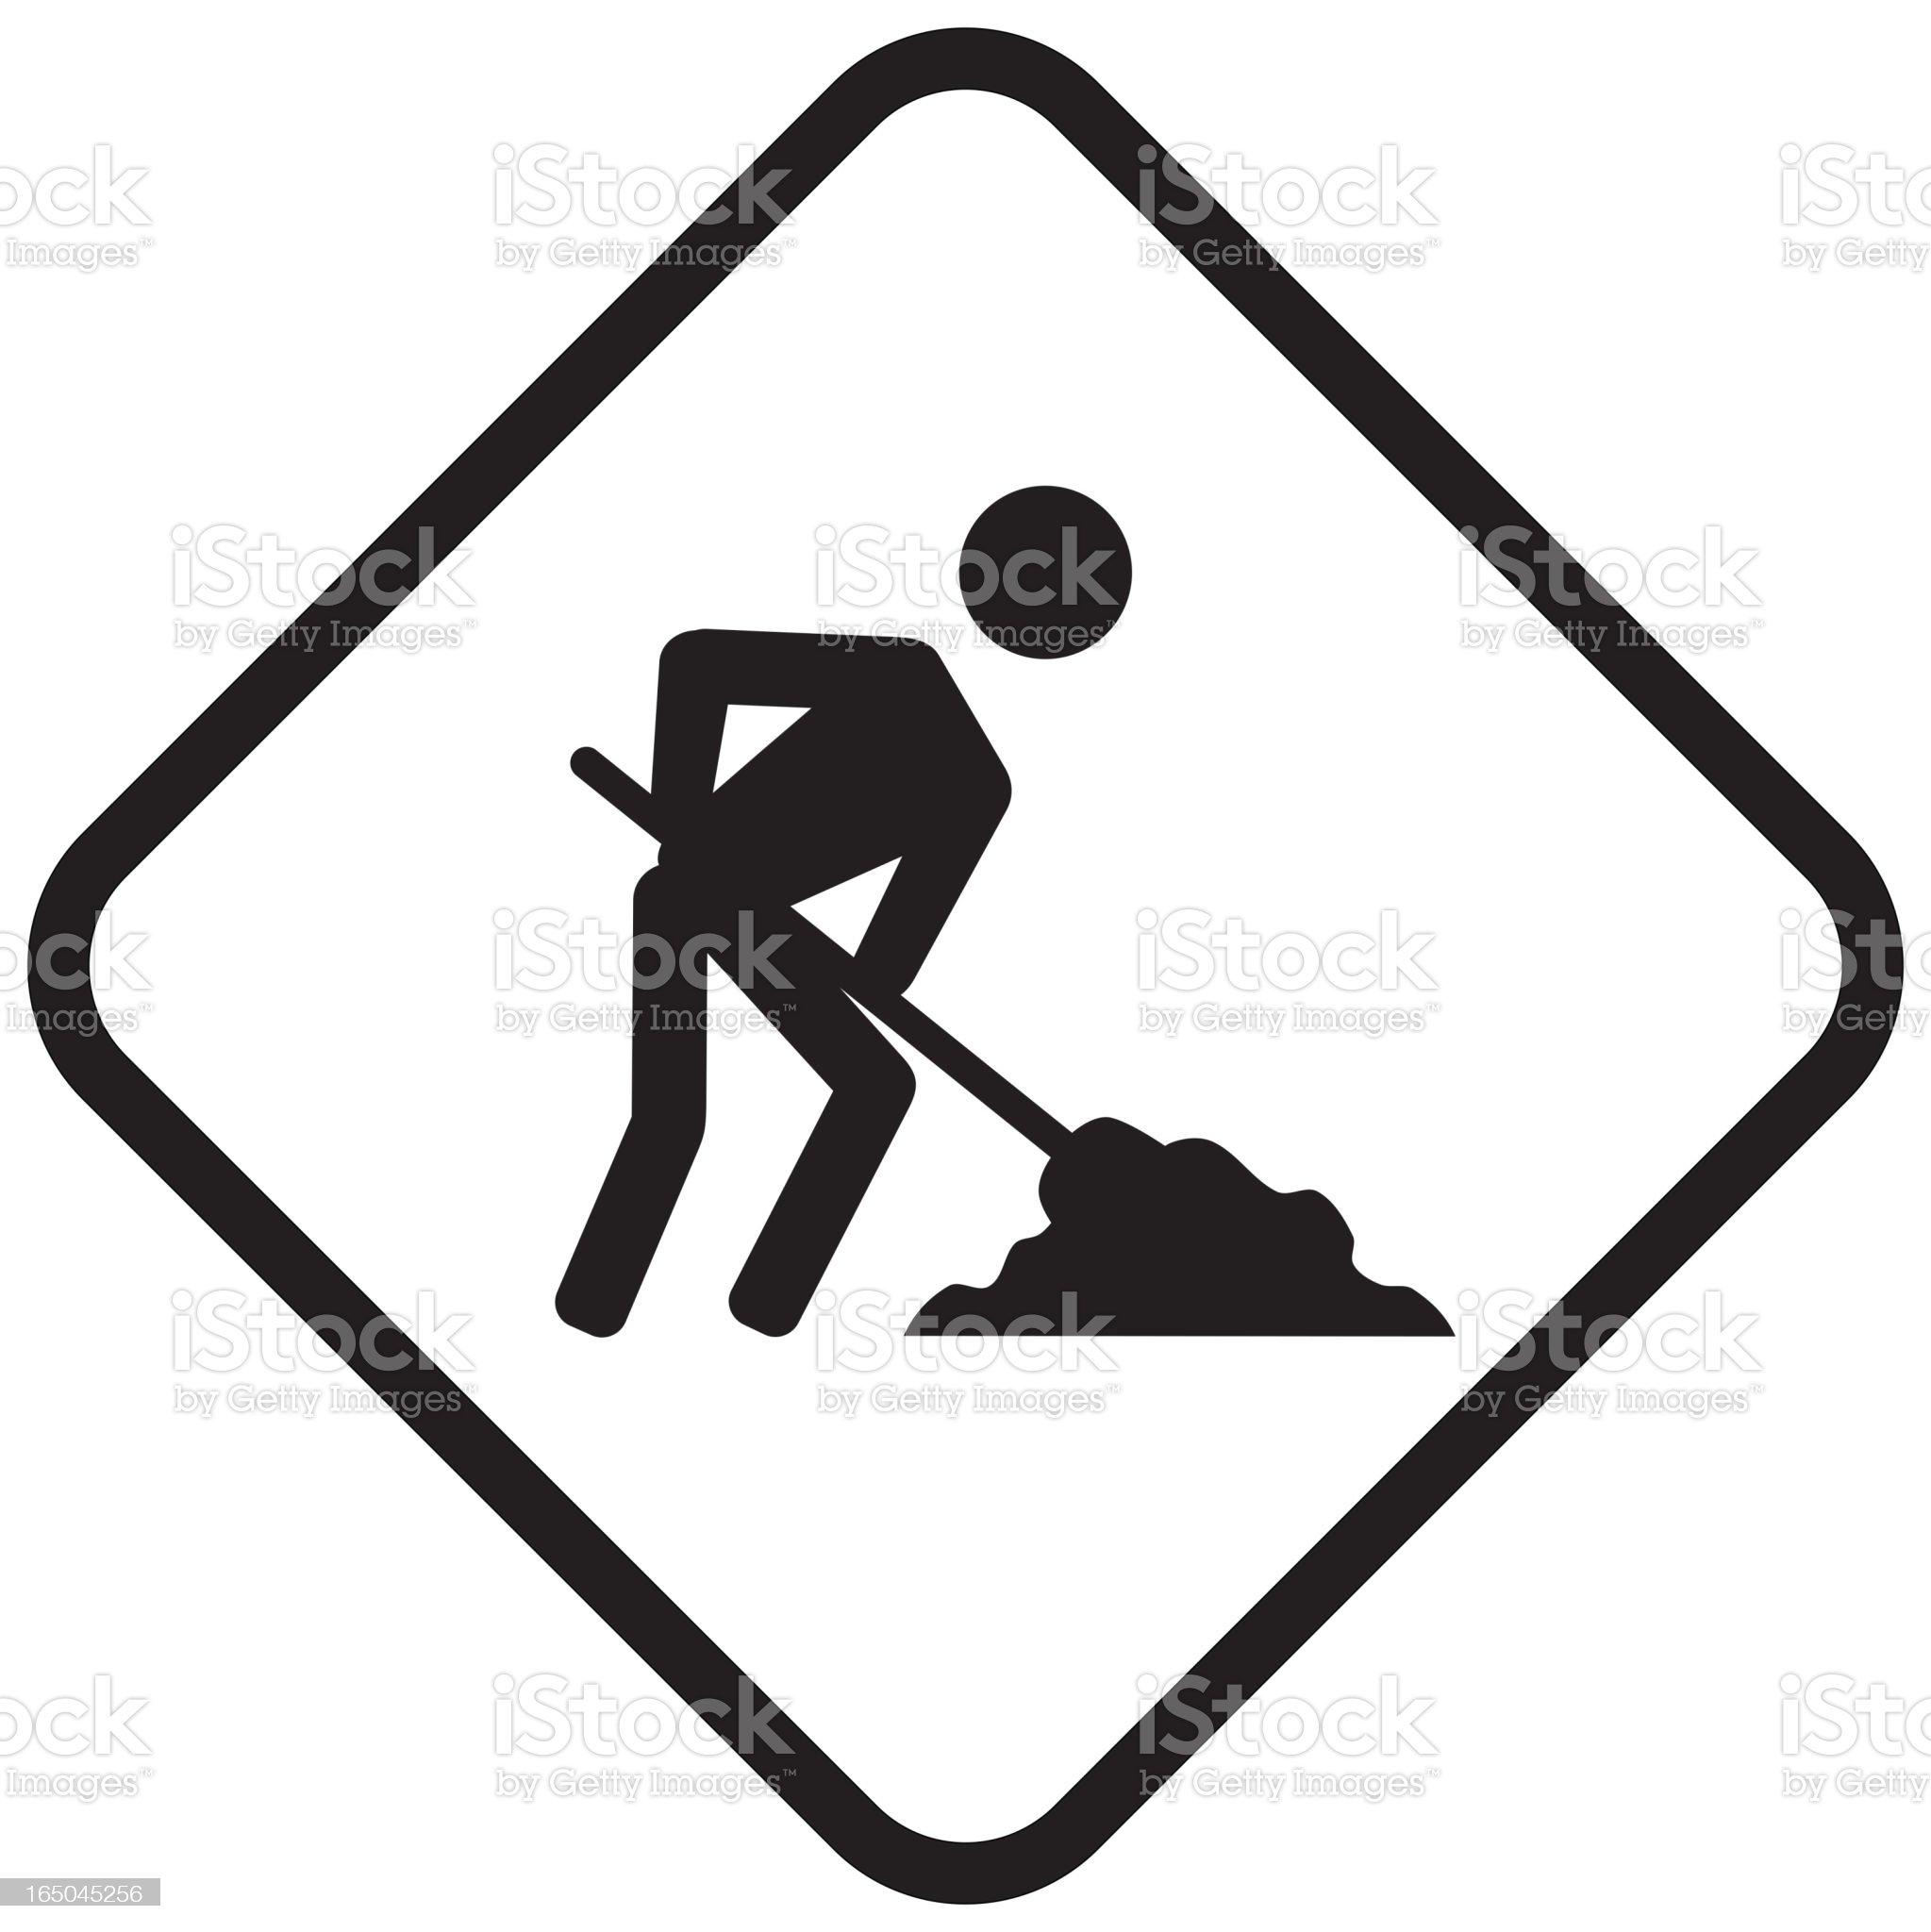 'under construction' icon royalty-free stock vector art